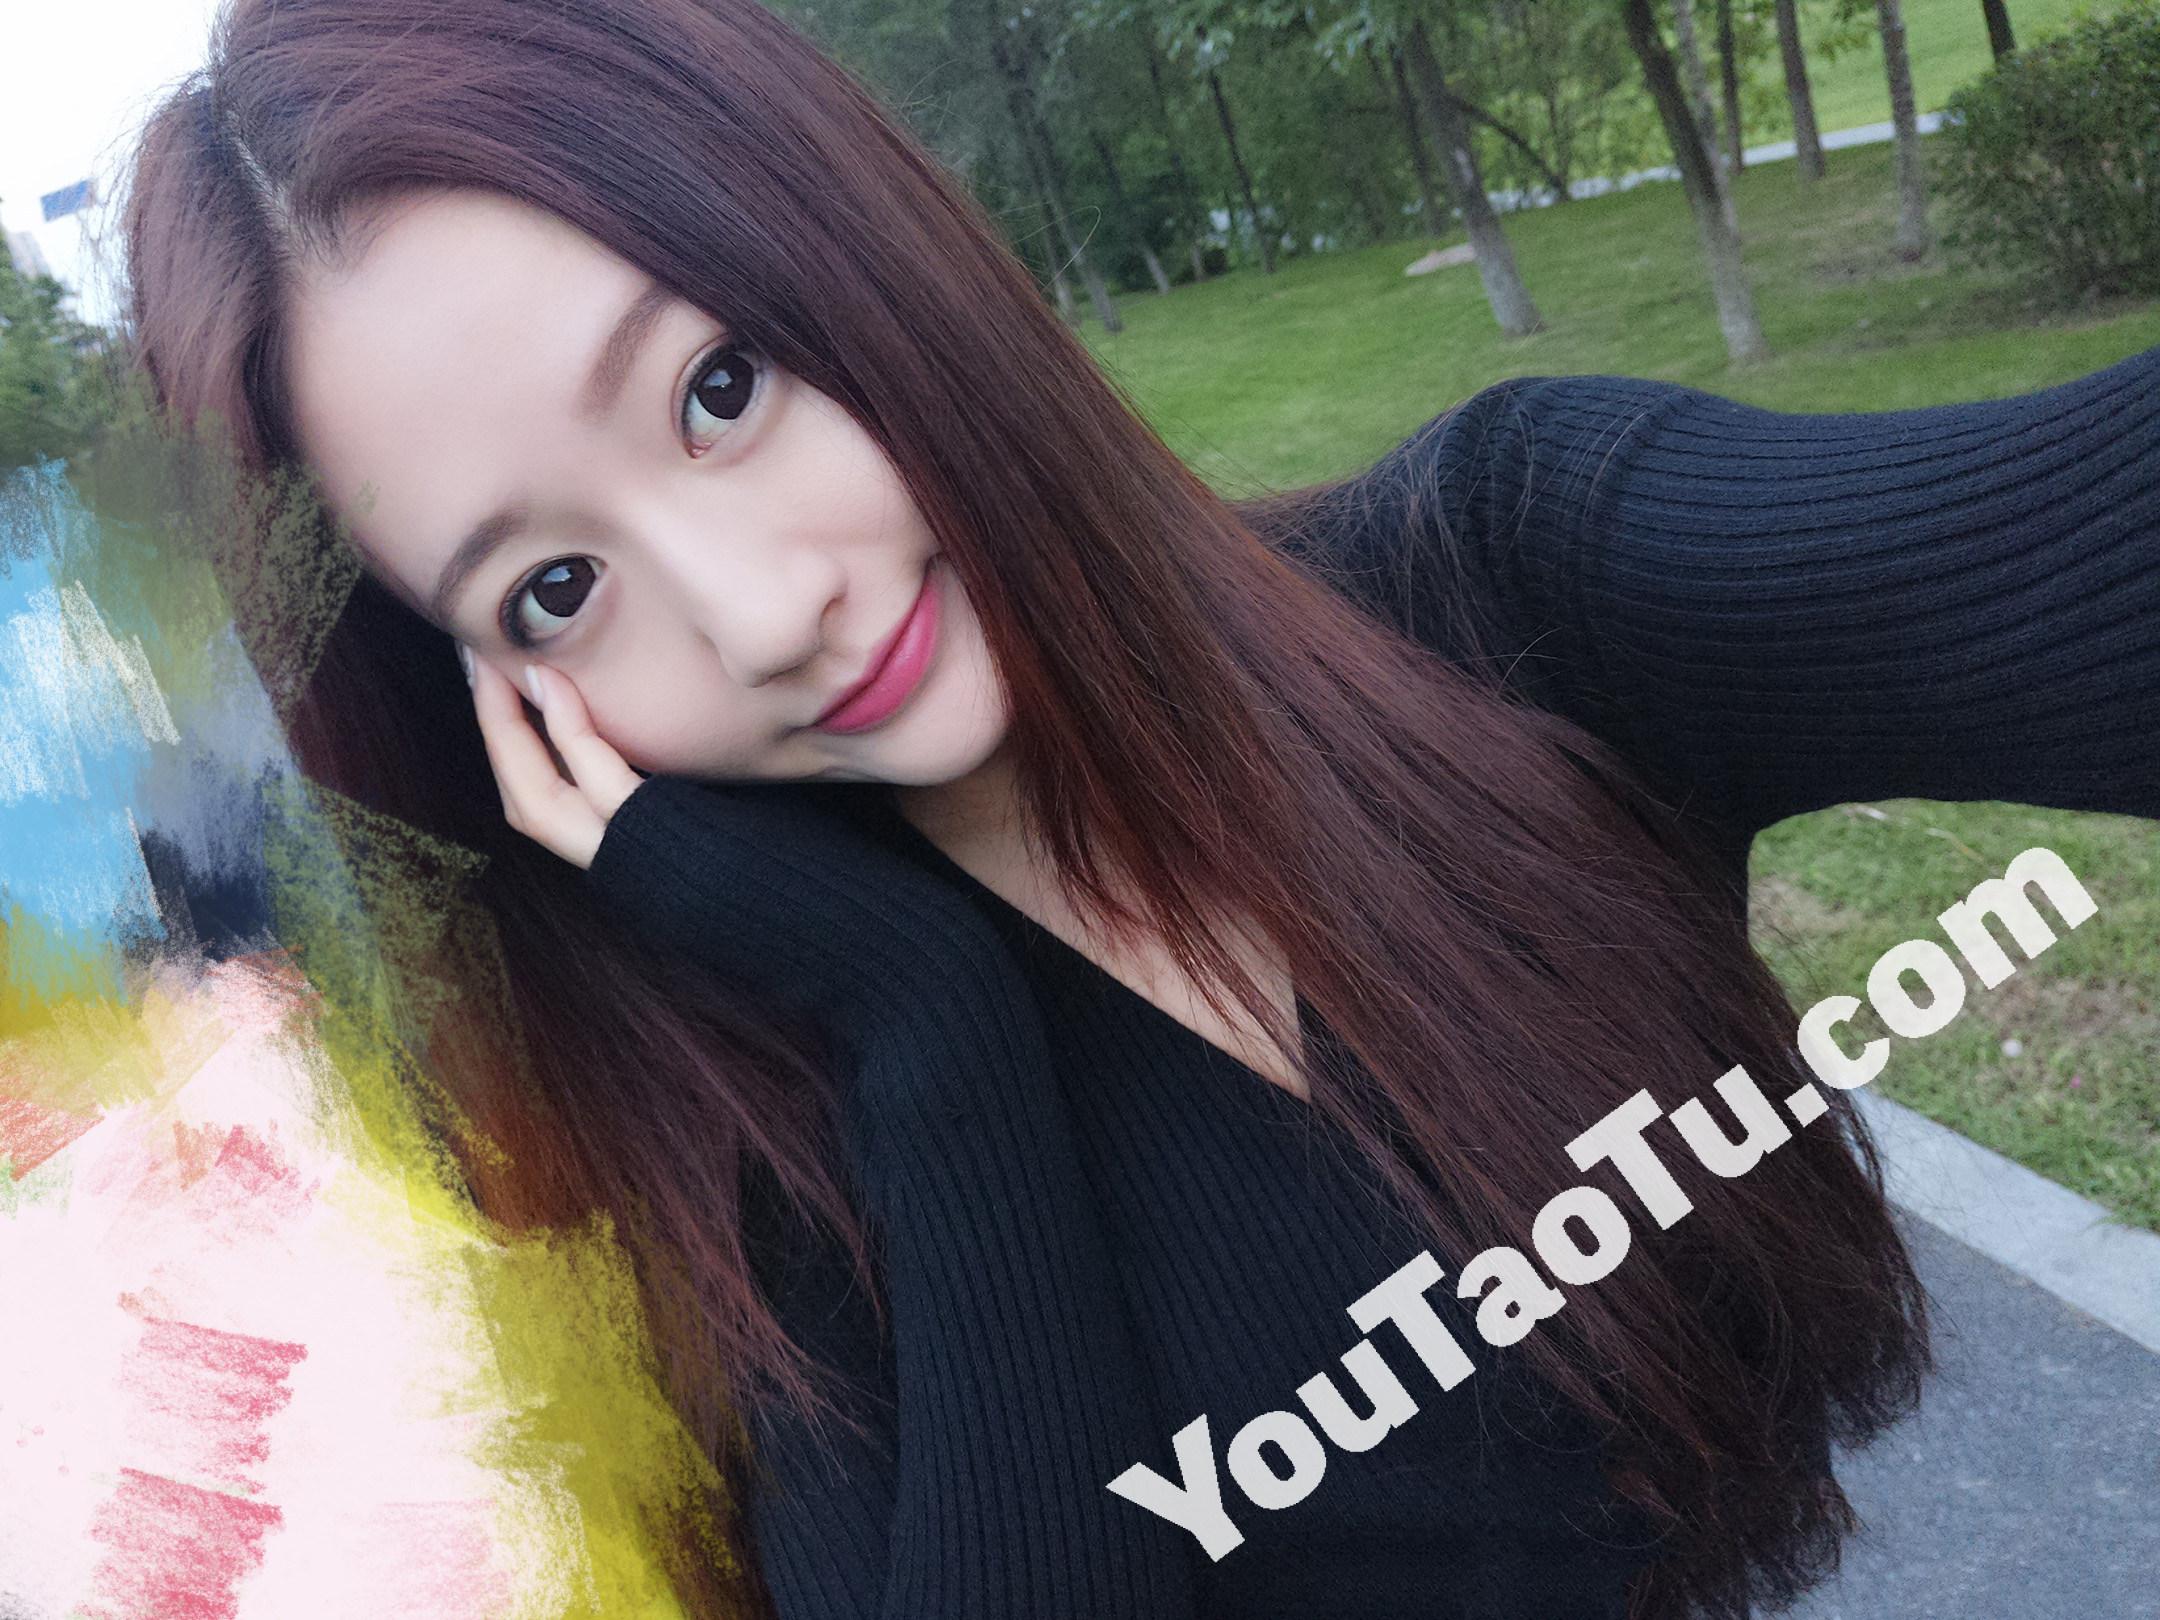 KK88 2500图+172视频 极力推荐真实可爱性感青春生活照-2